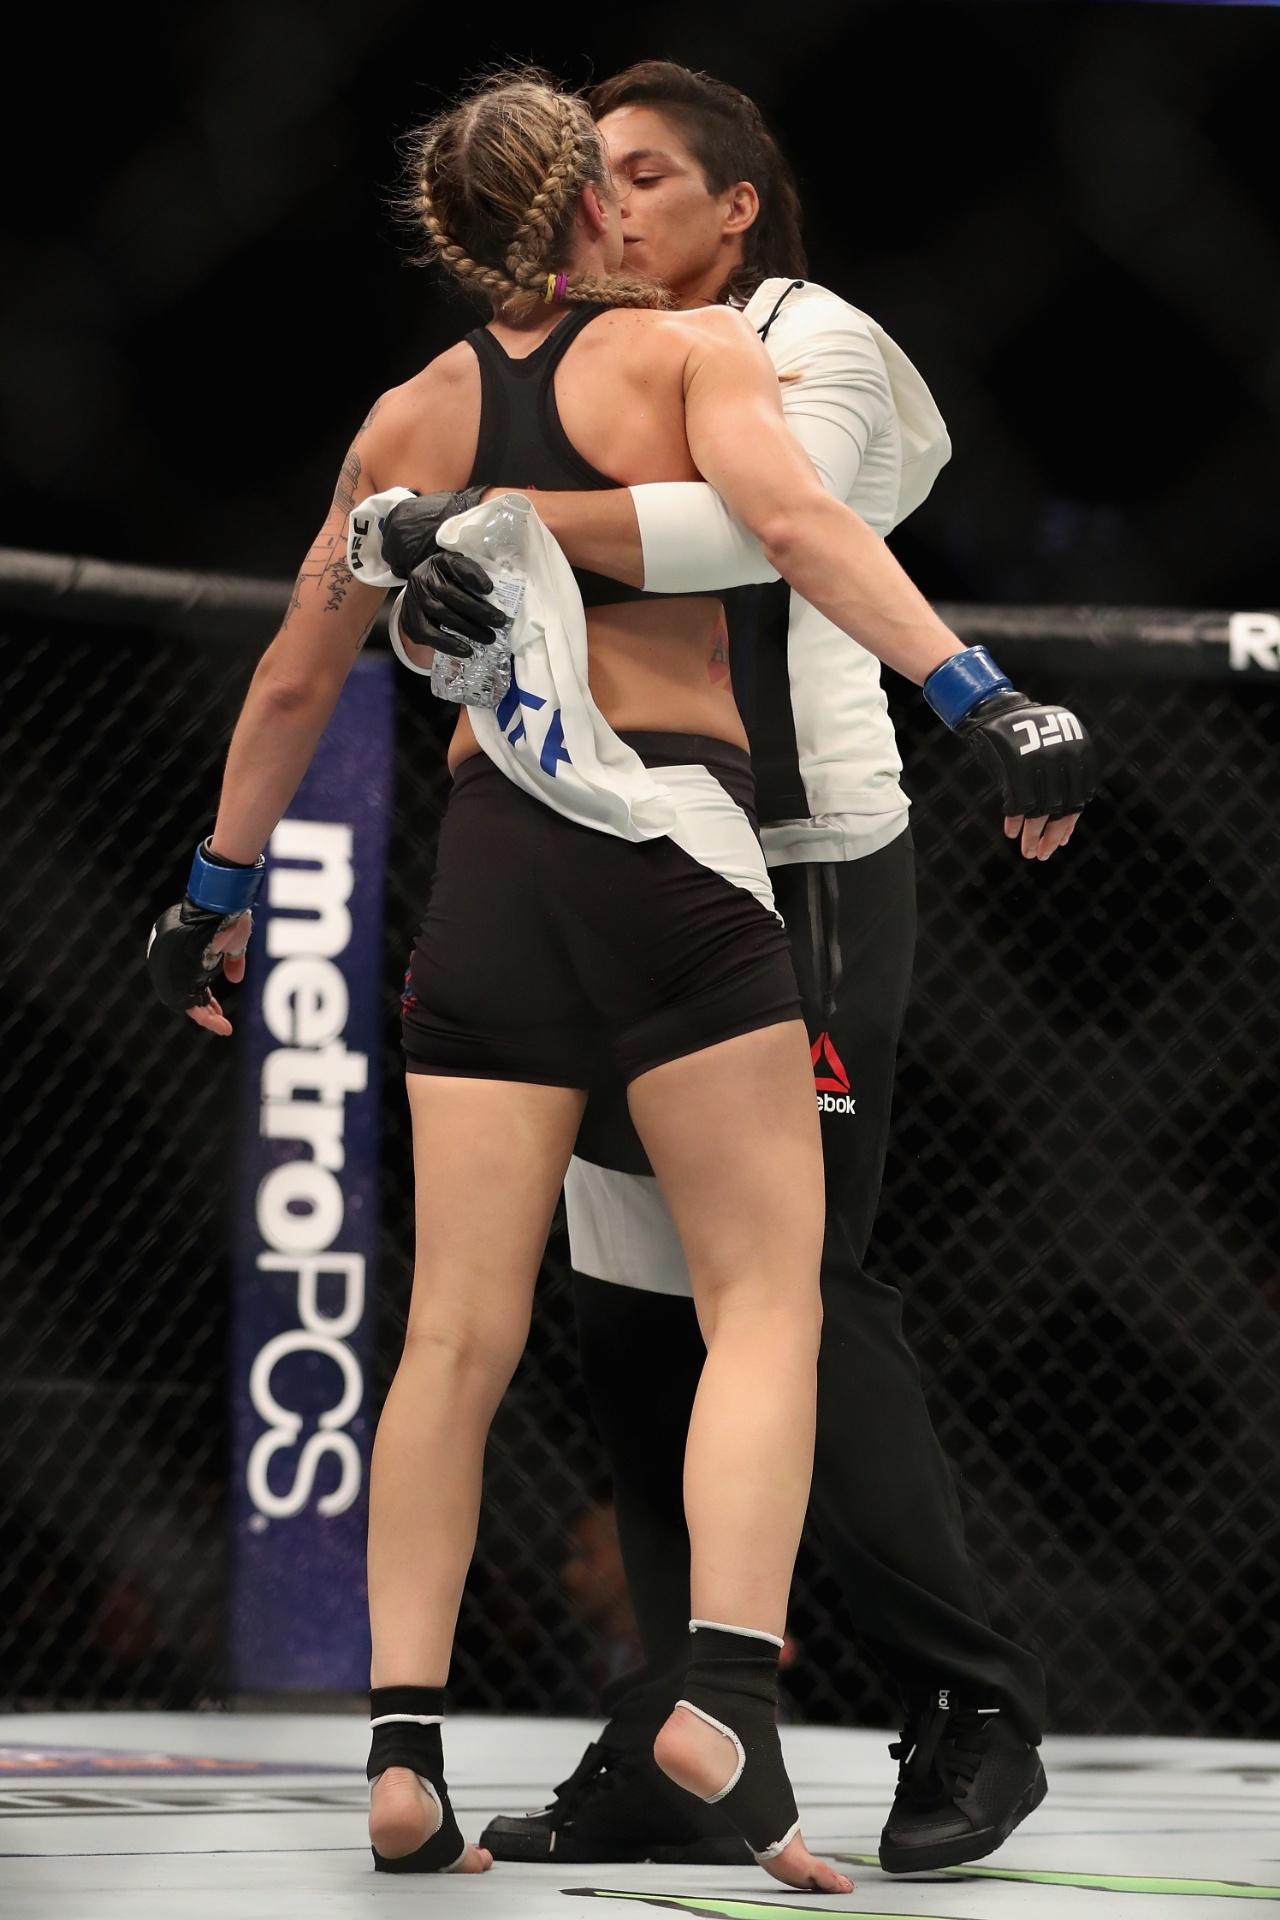 Campeã do UFC, Amanda Nunes beija namorada, Nina Ansaroff, após vitória